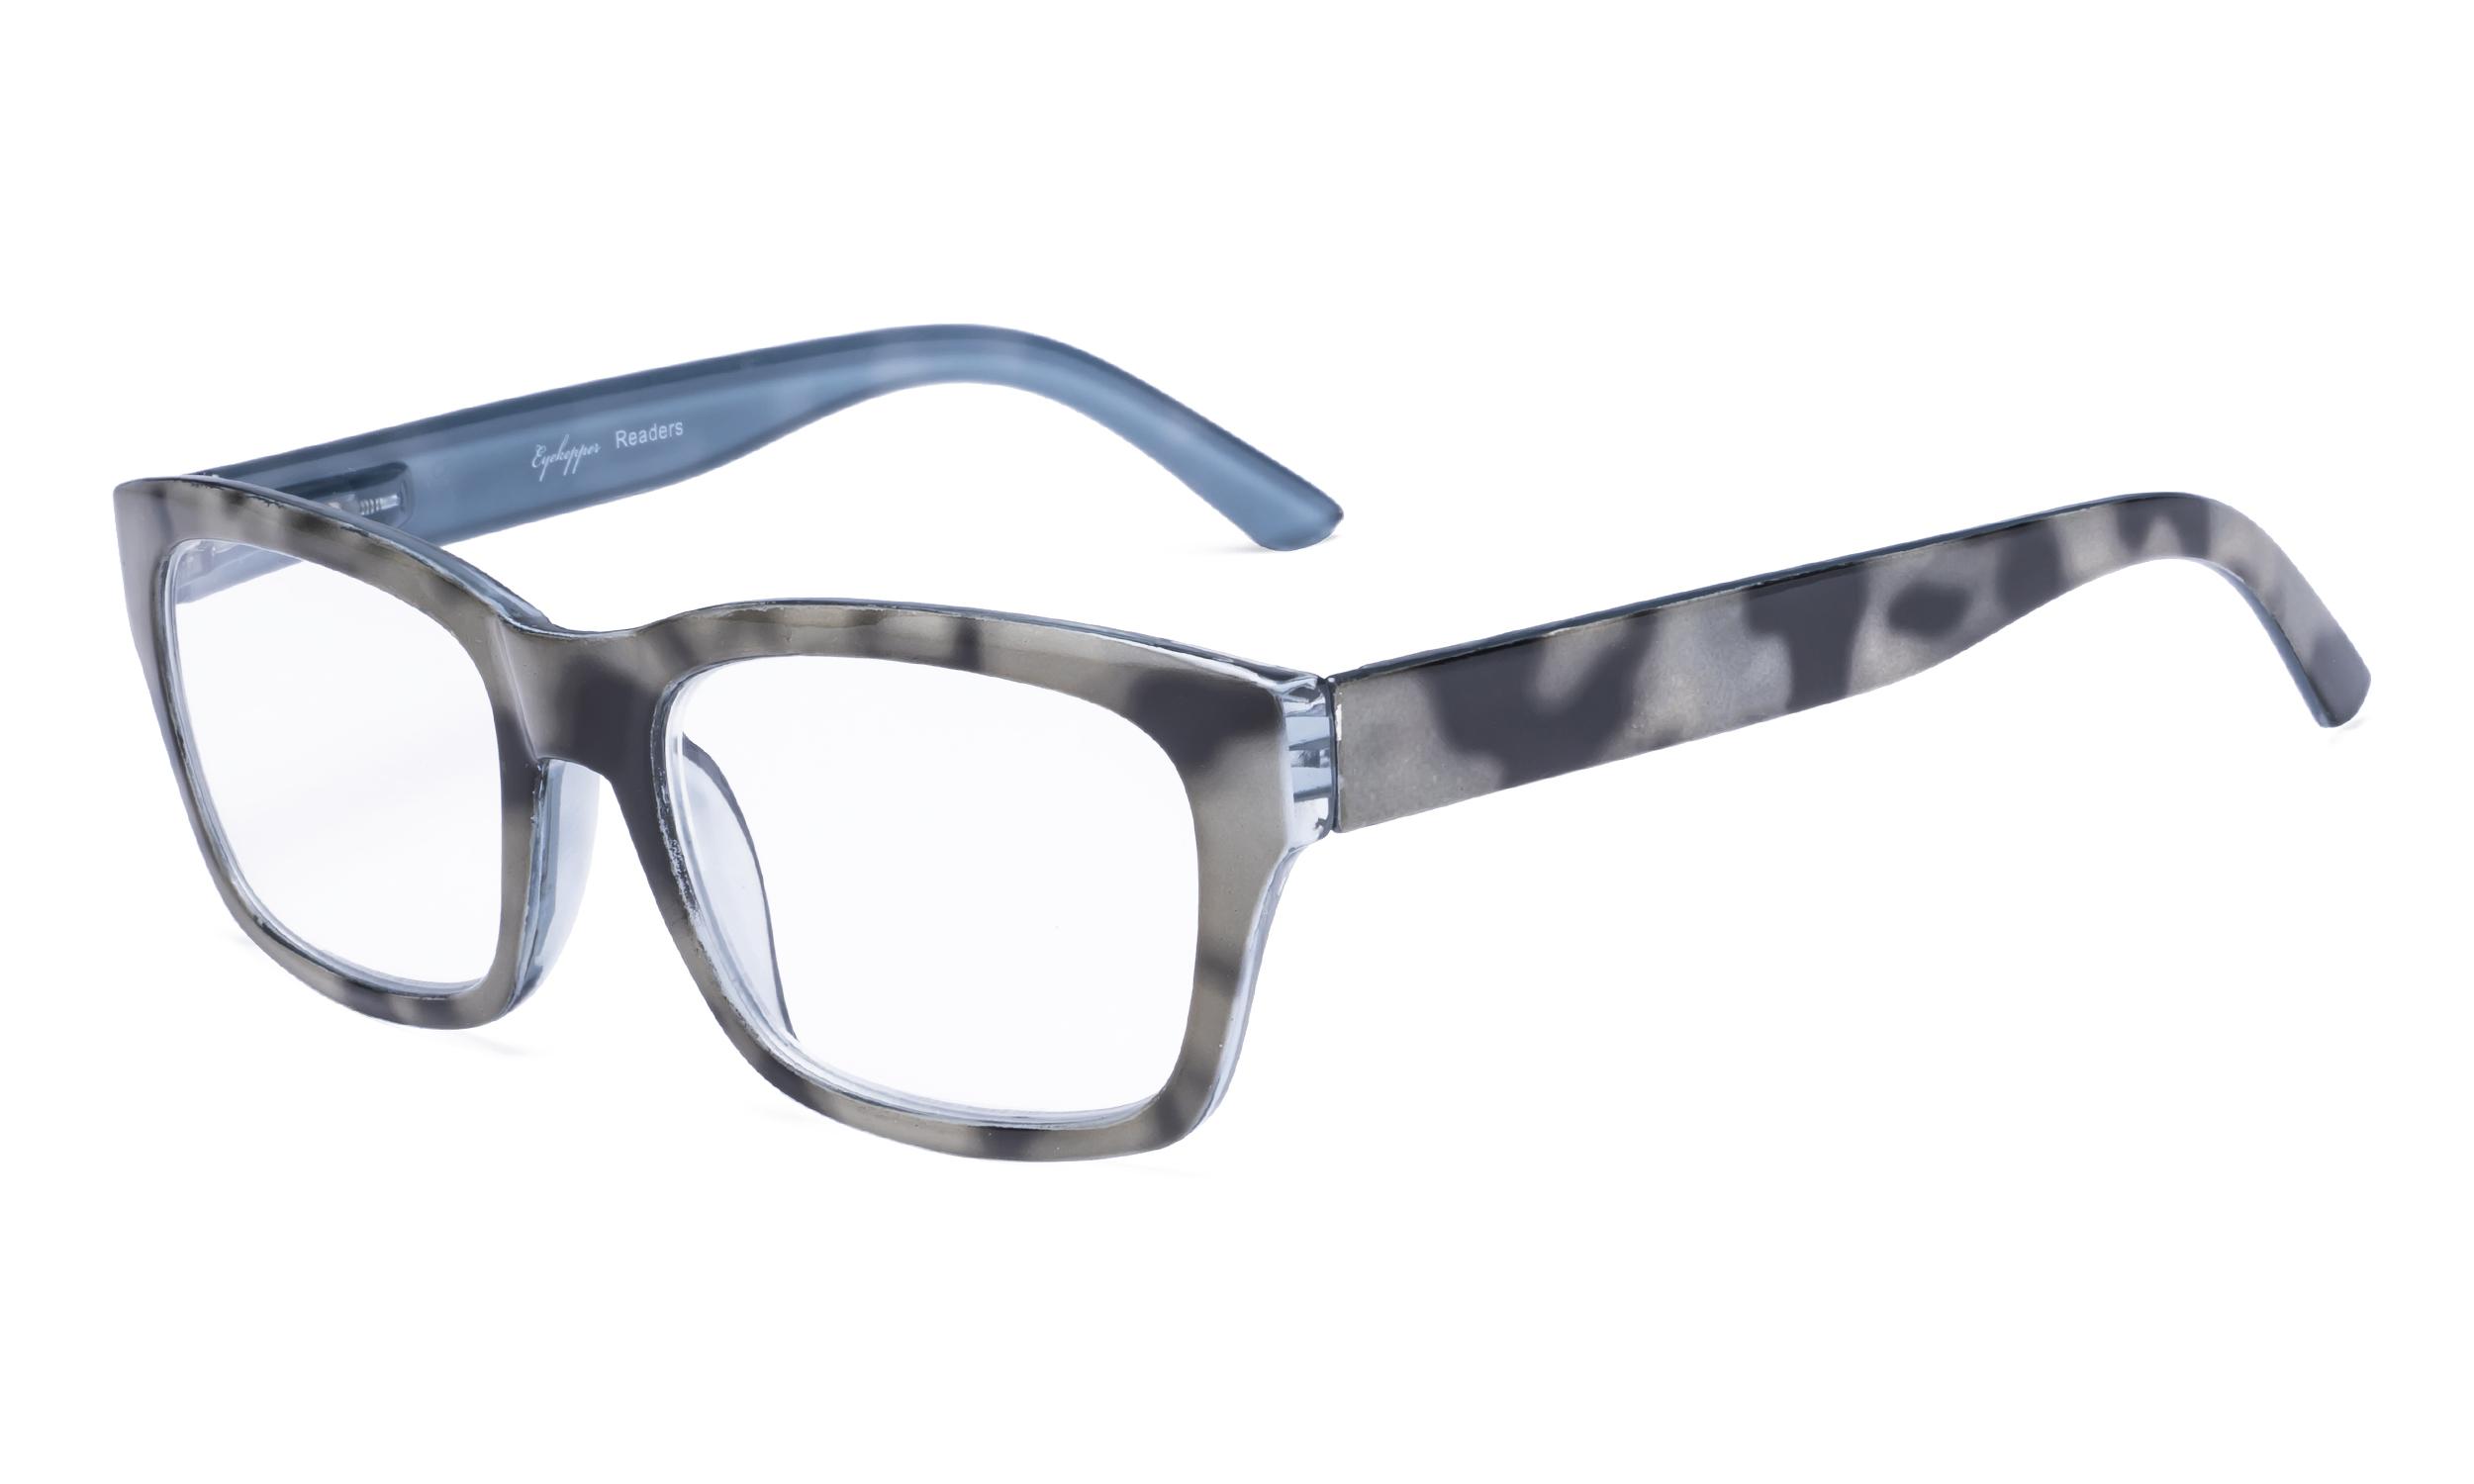 0564072df325 Eyekepper Reading Glasses Quality Spring Hinge Temples with Large Square  Frame Men Women Black-Grey R045